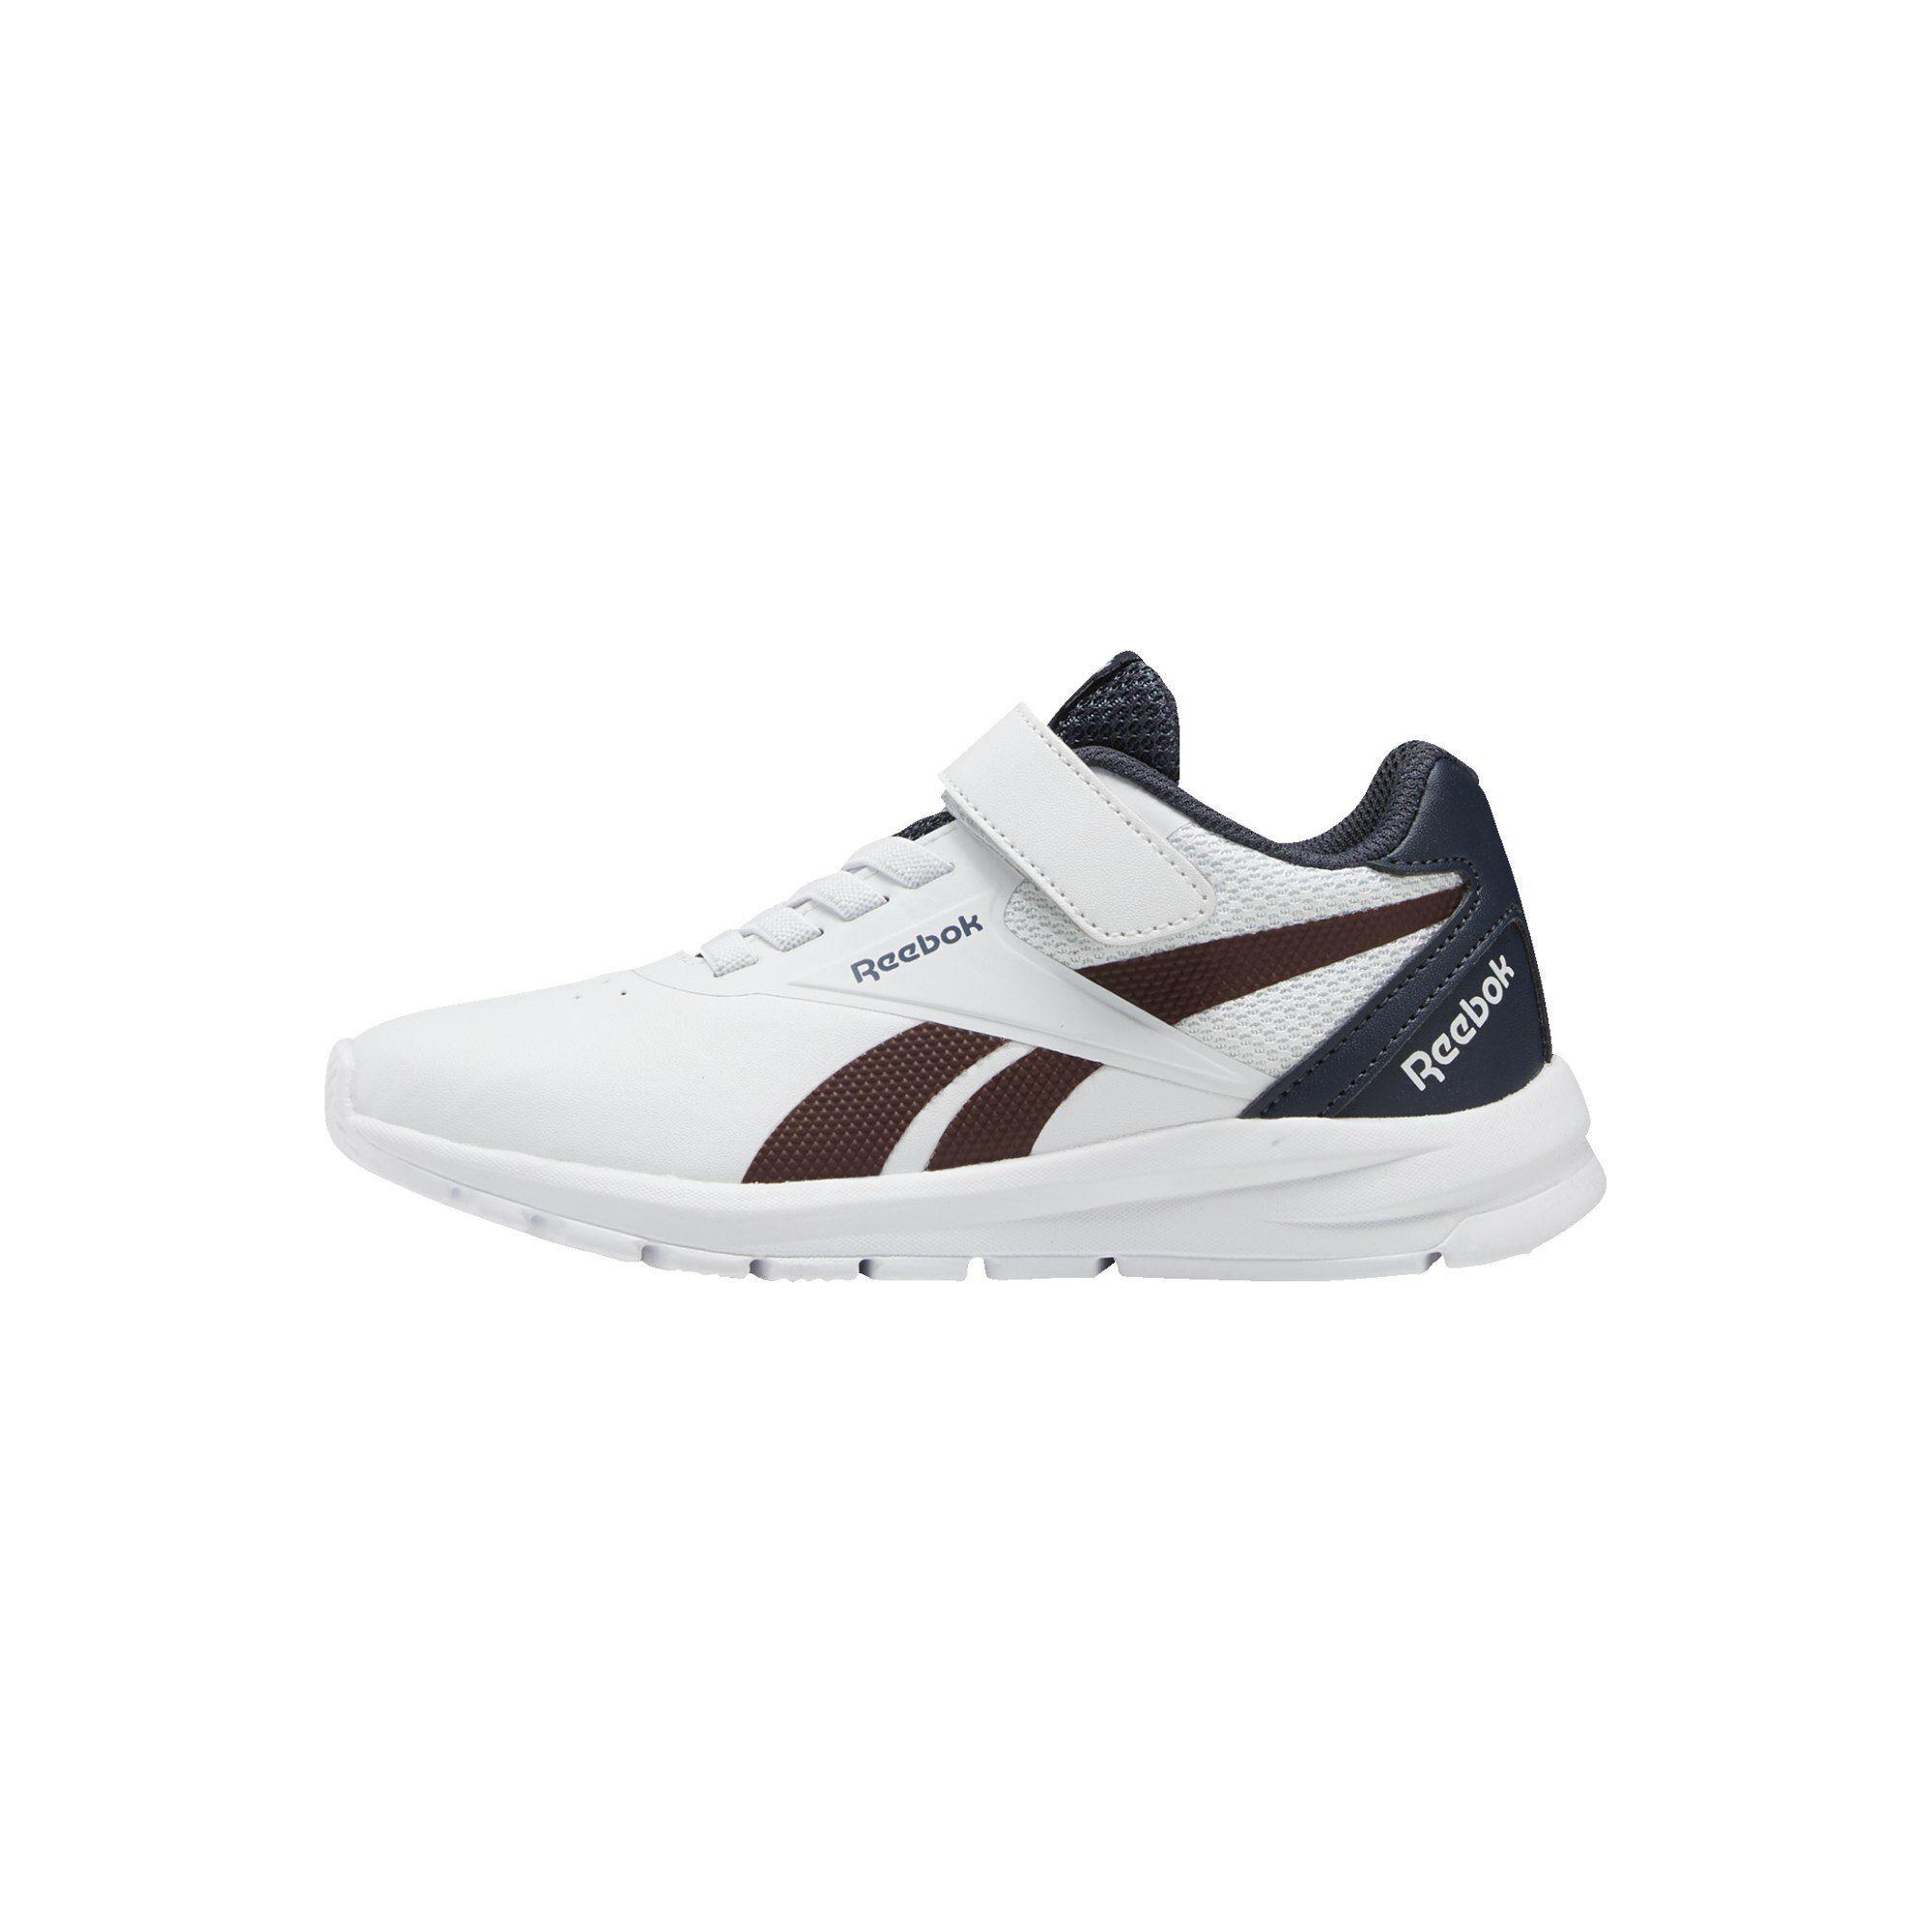 Reebok »Reebok Rush Runner 2.0 Shoes« Trainingsschuh online kaufen | OTTO